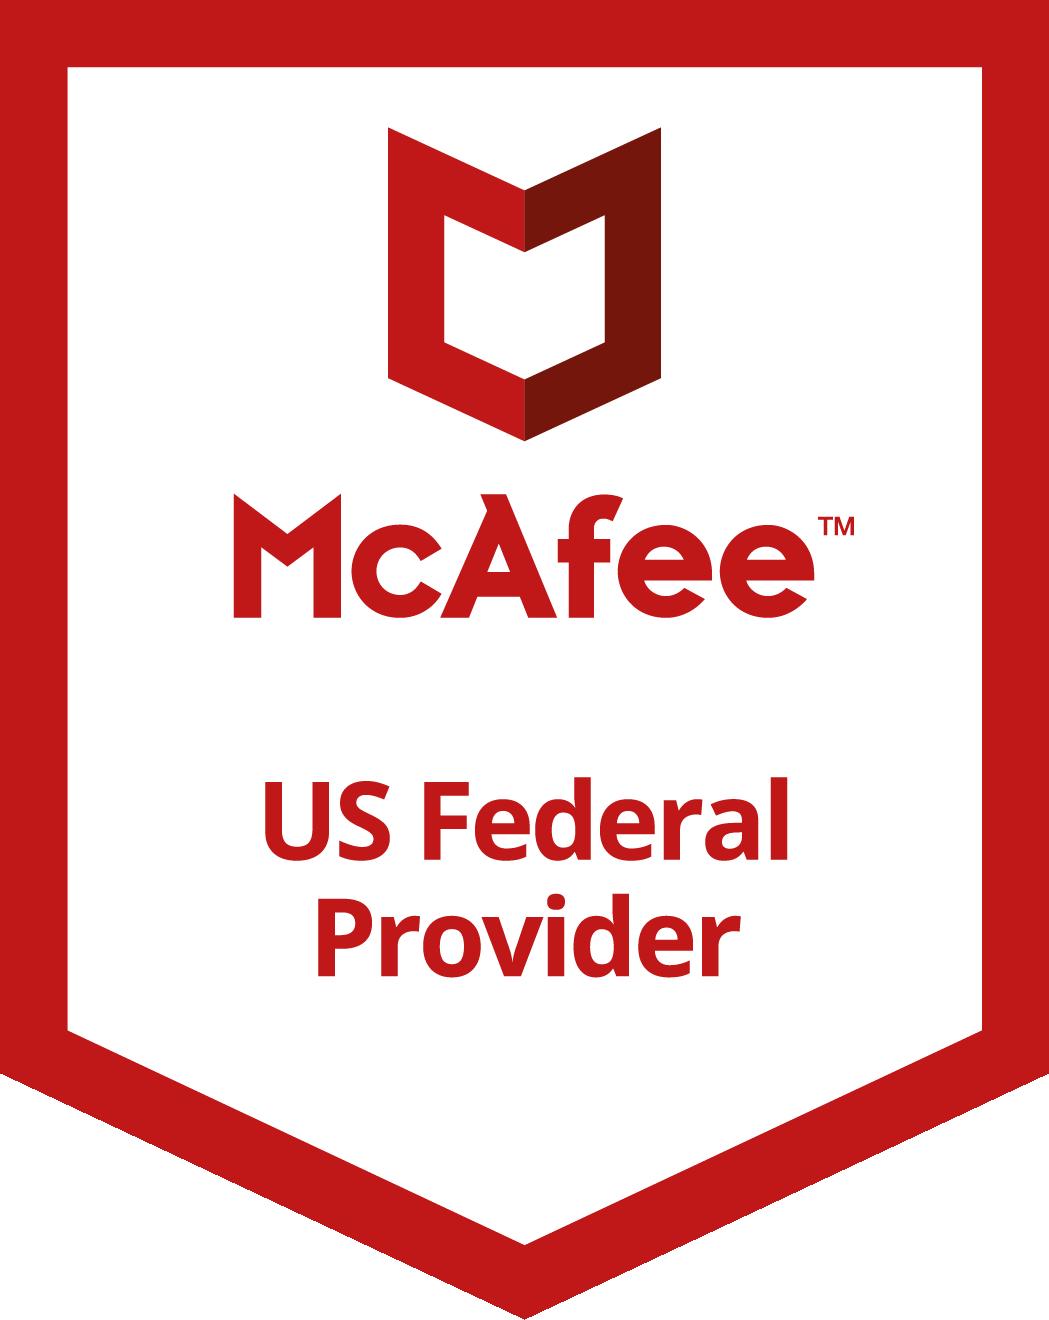 McAfee U.S. Federal Provider Badge